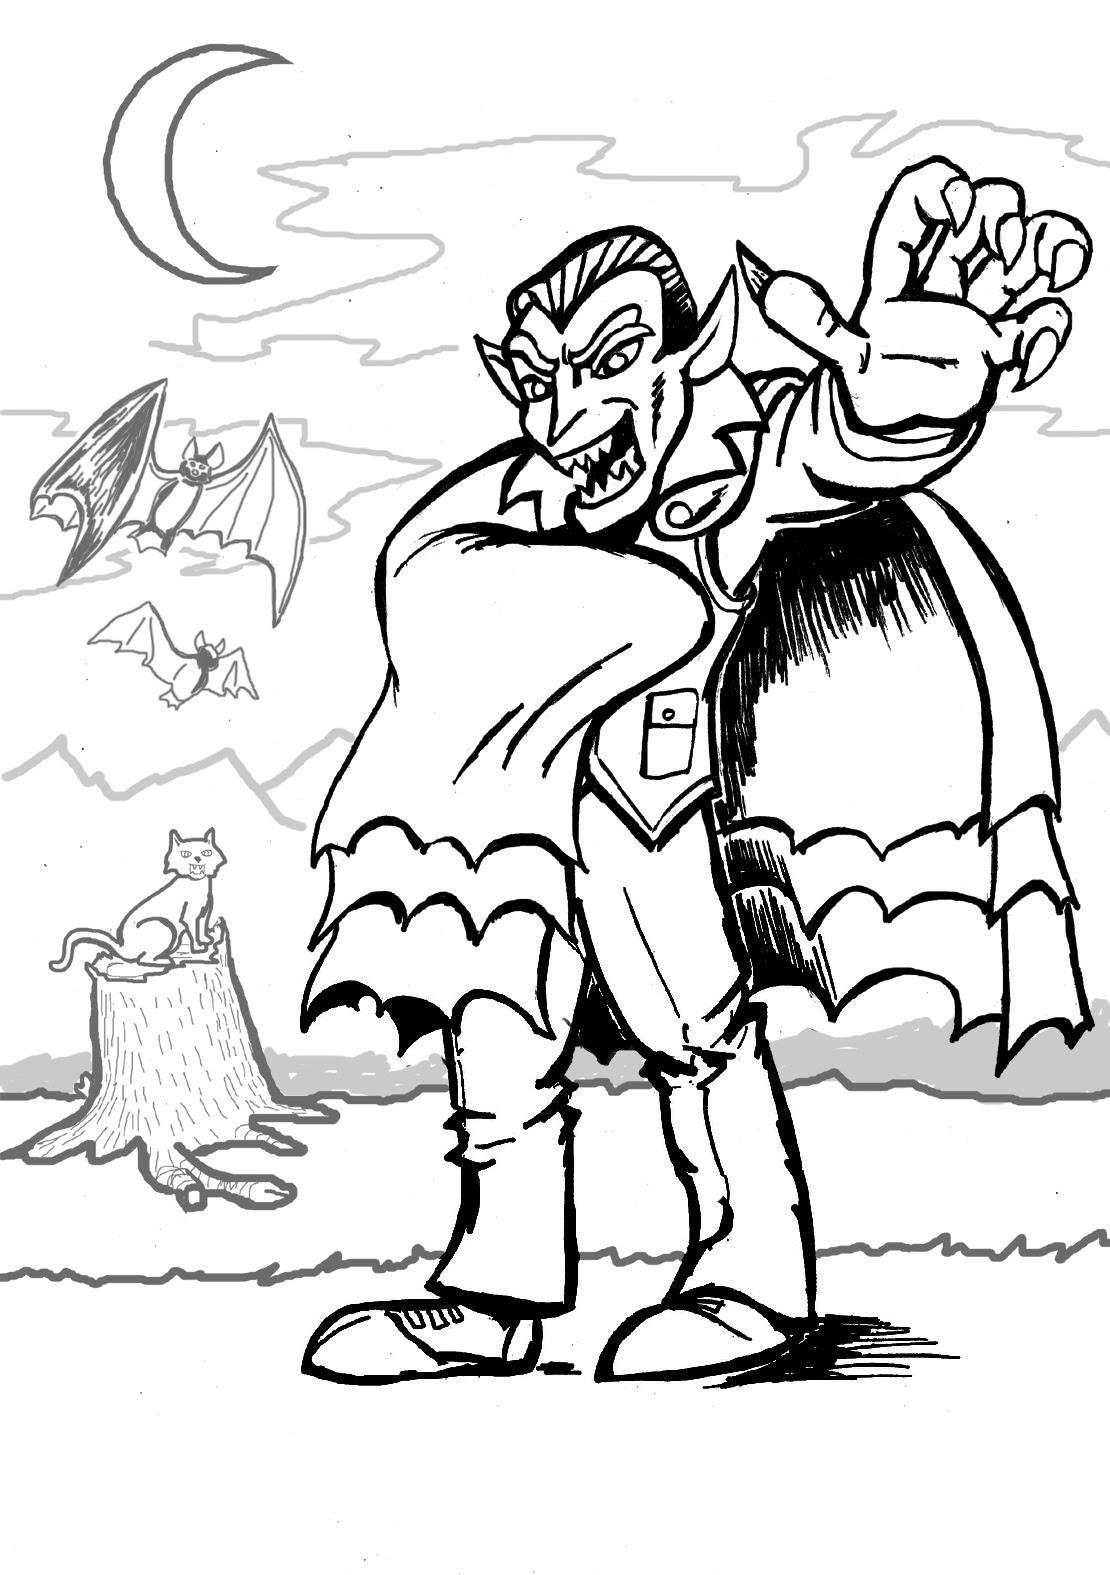 Vampire Drawing For Kids at GetDrawings | Free download